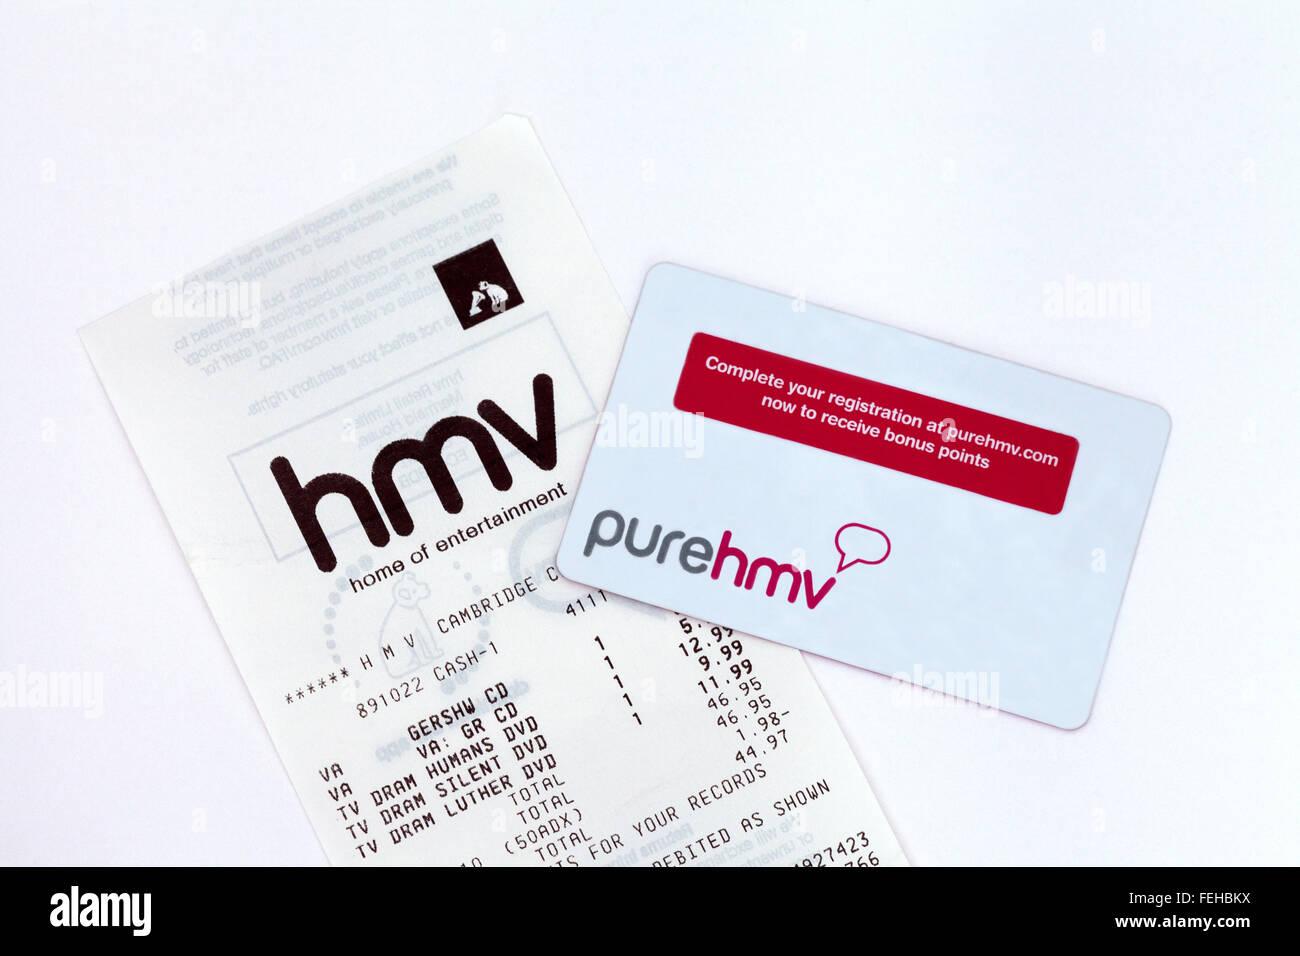 HMV customer loyalty card and receipt, UK - Stock Image